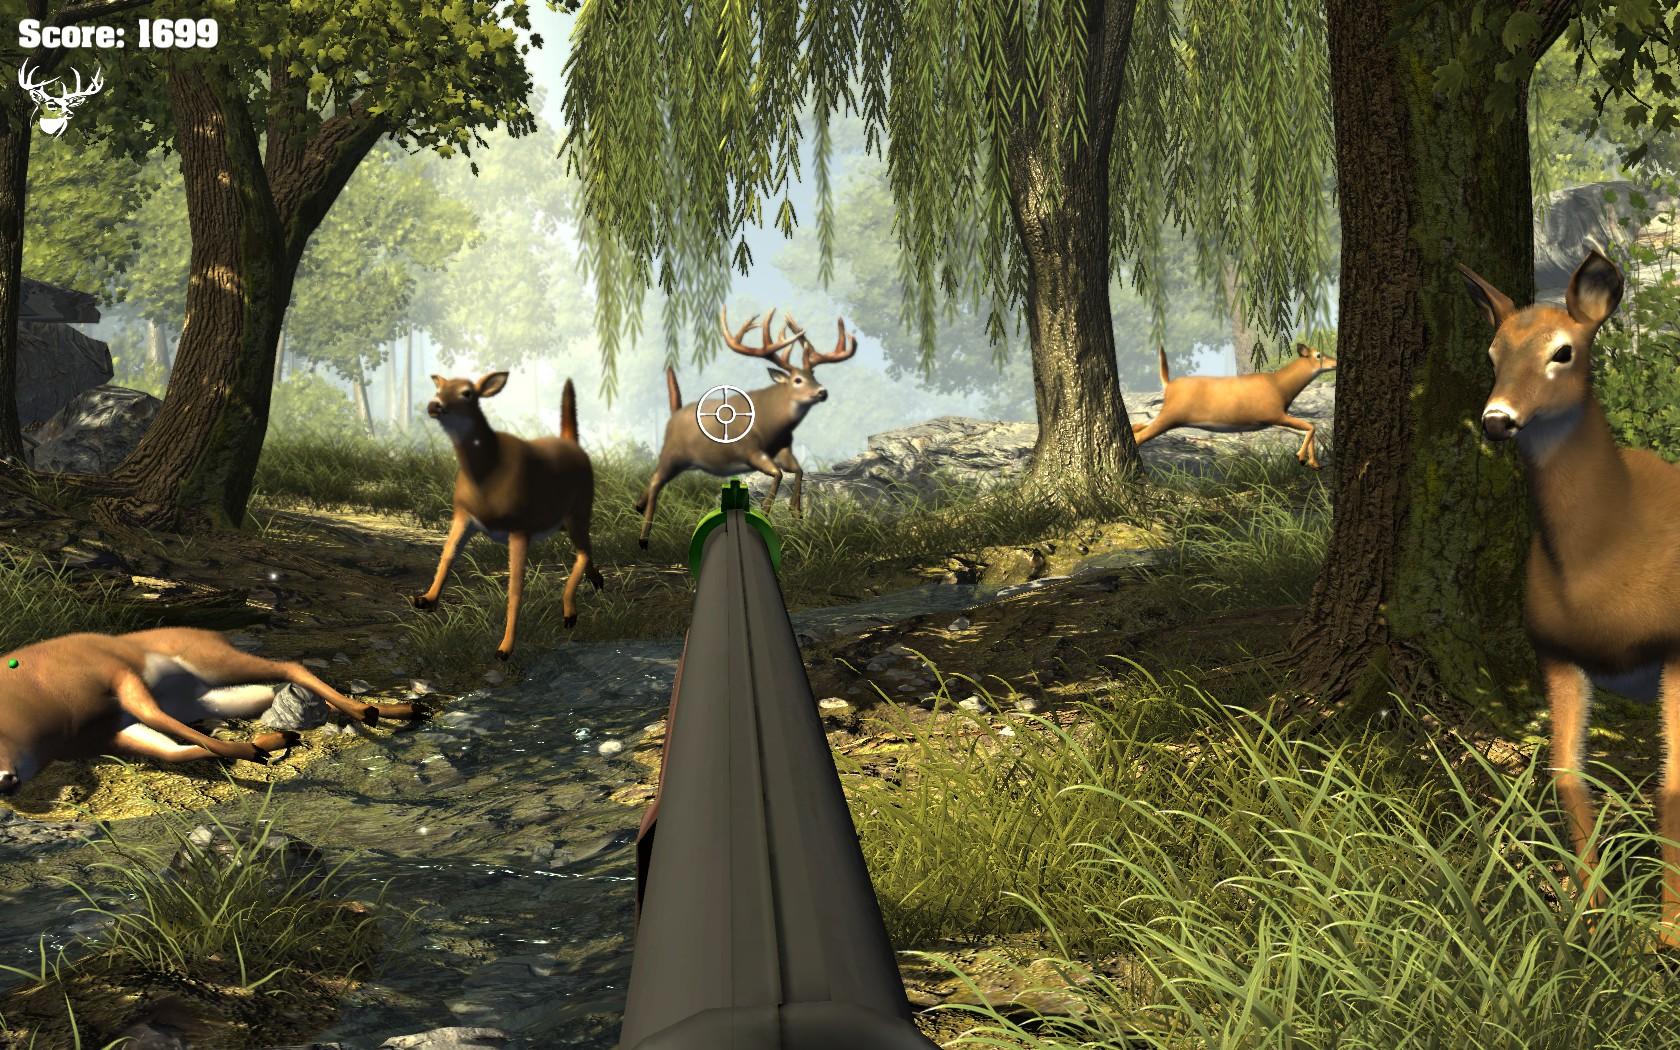 MAME big buck hunter 2006 call of the wild 0.177 - YouTube